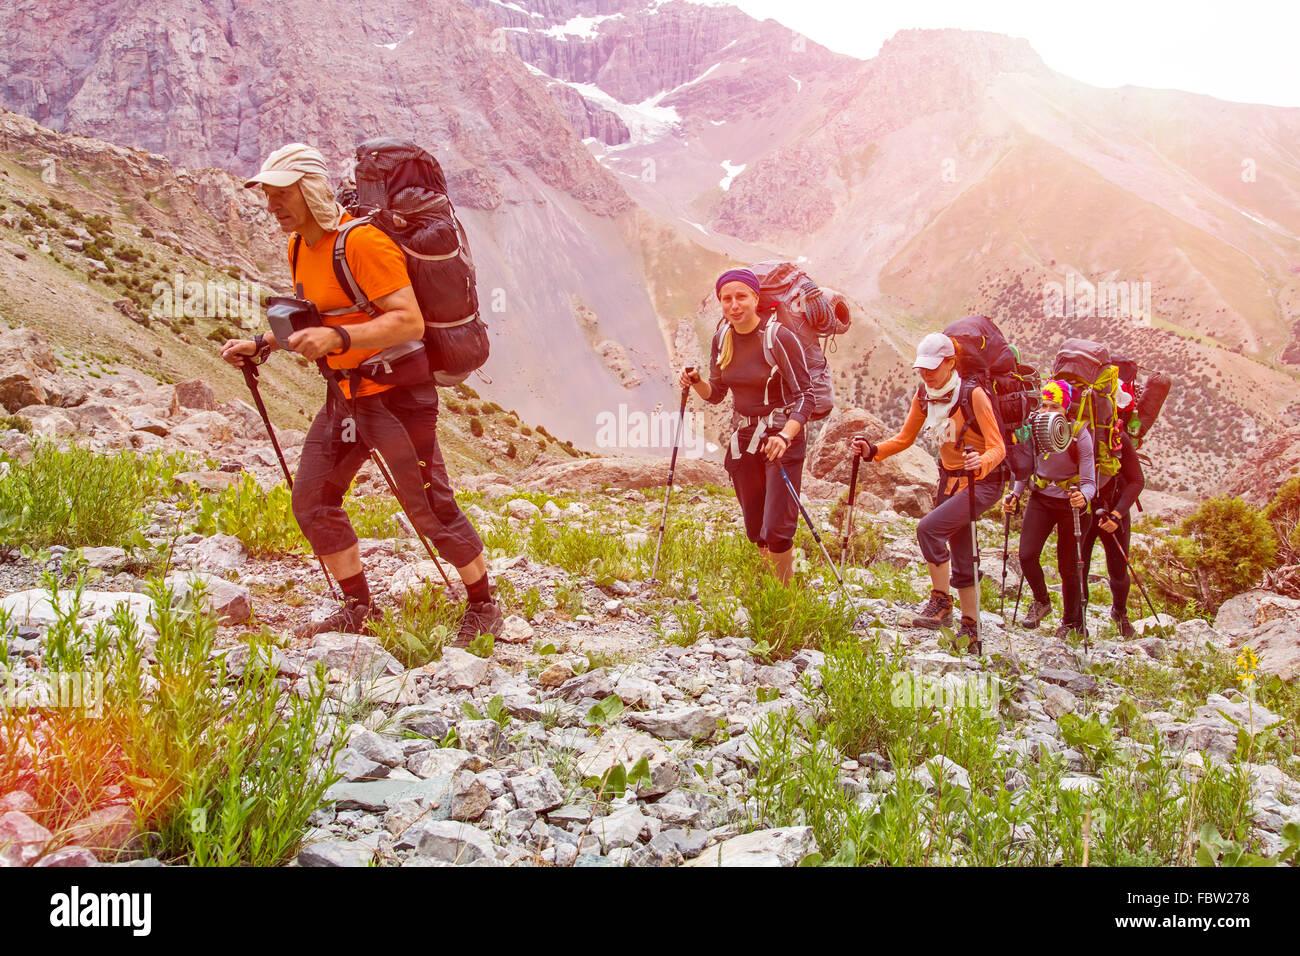 Trekking in Himalaya - Stock Image